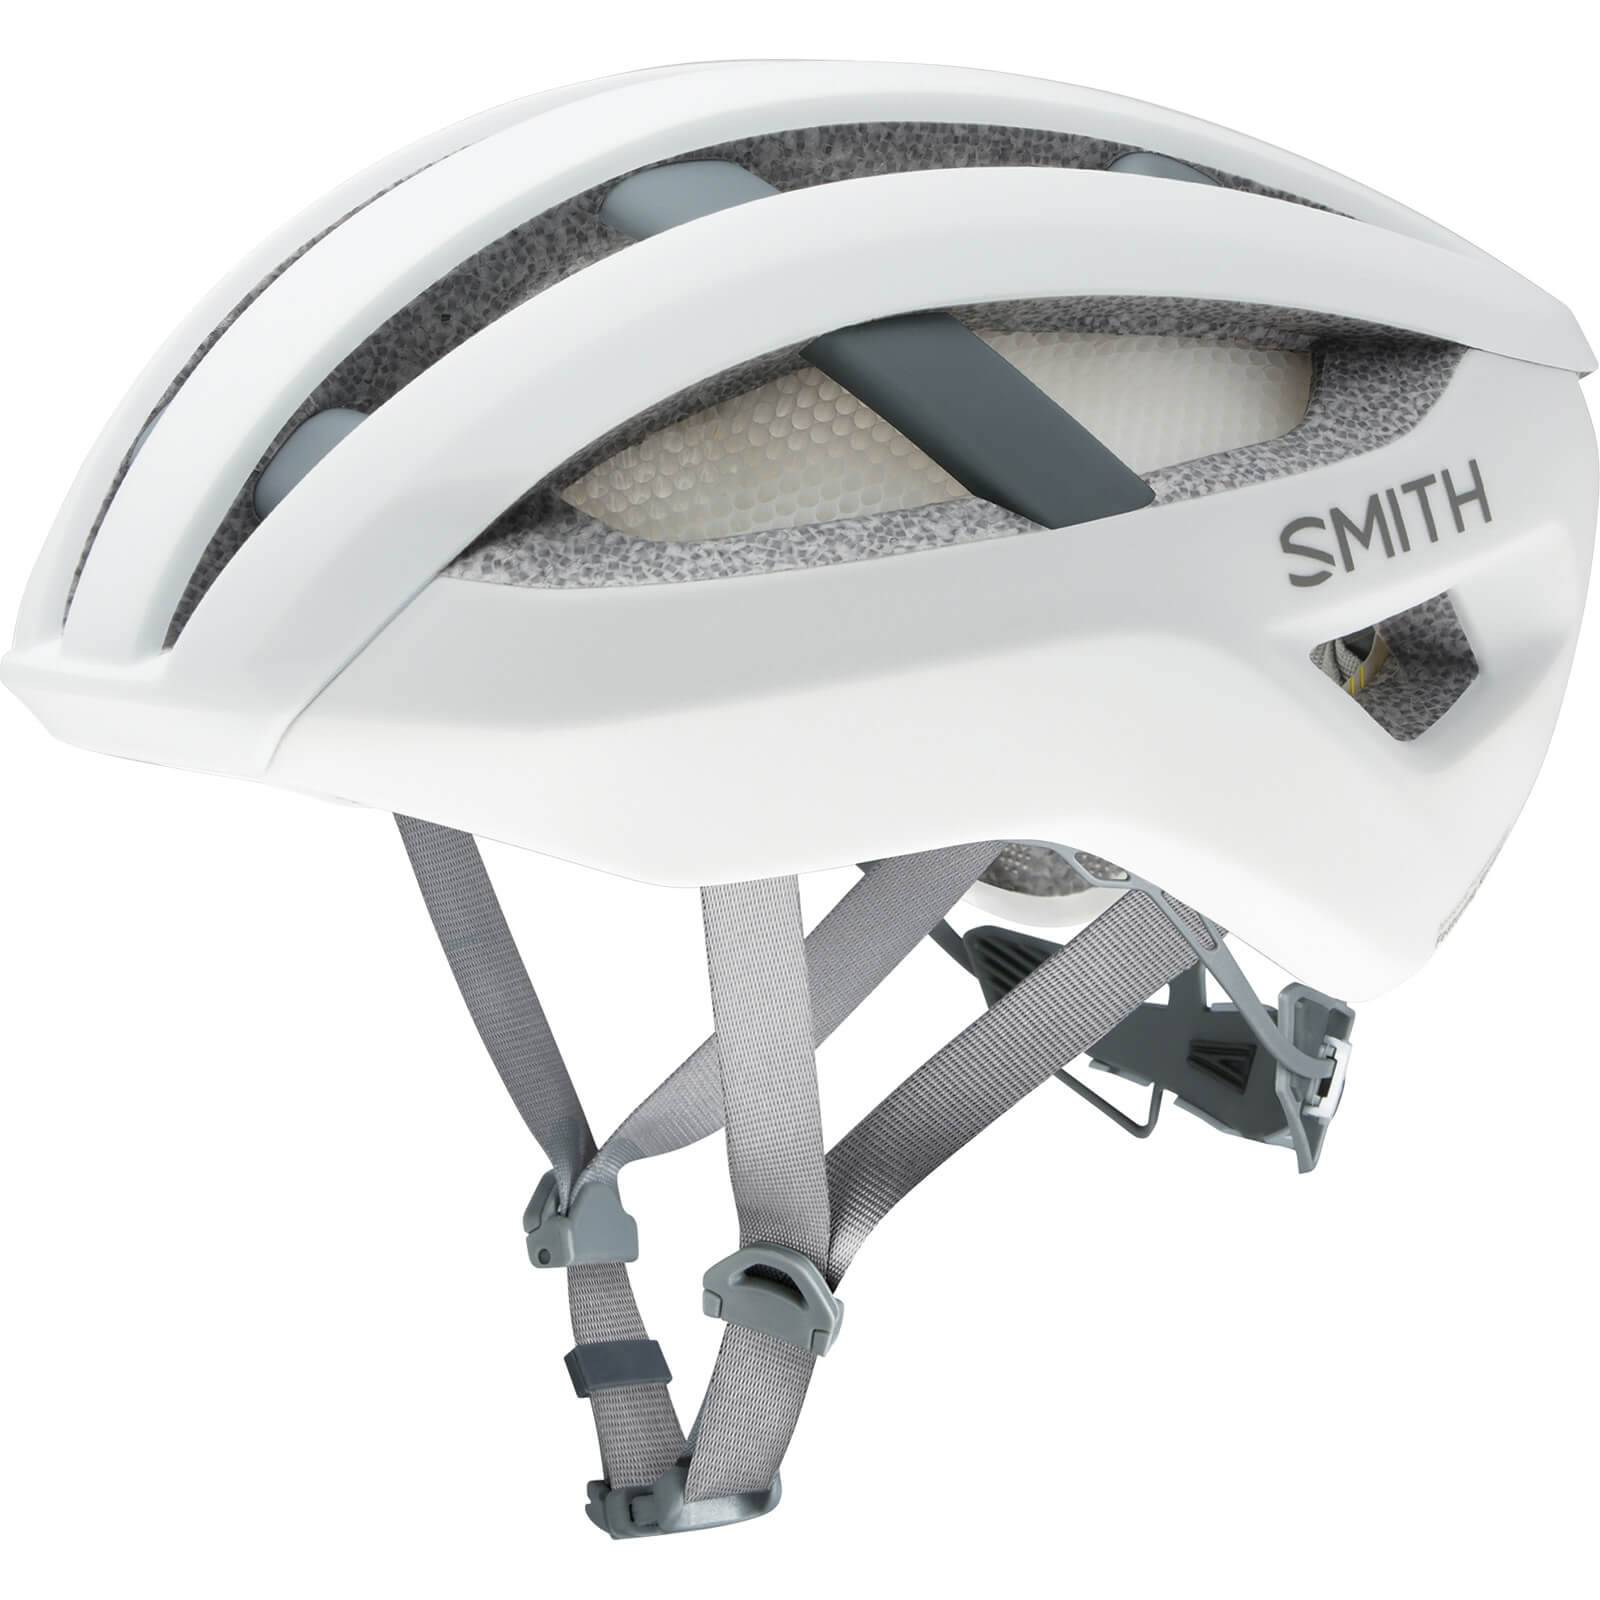 Smith Network MIPS Road Helmet - Medium - Matte White; unisex